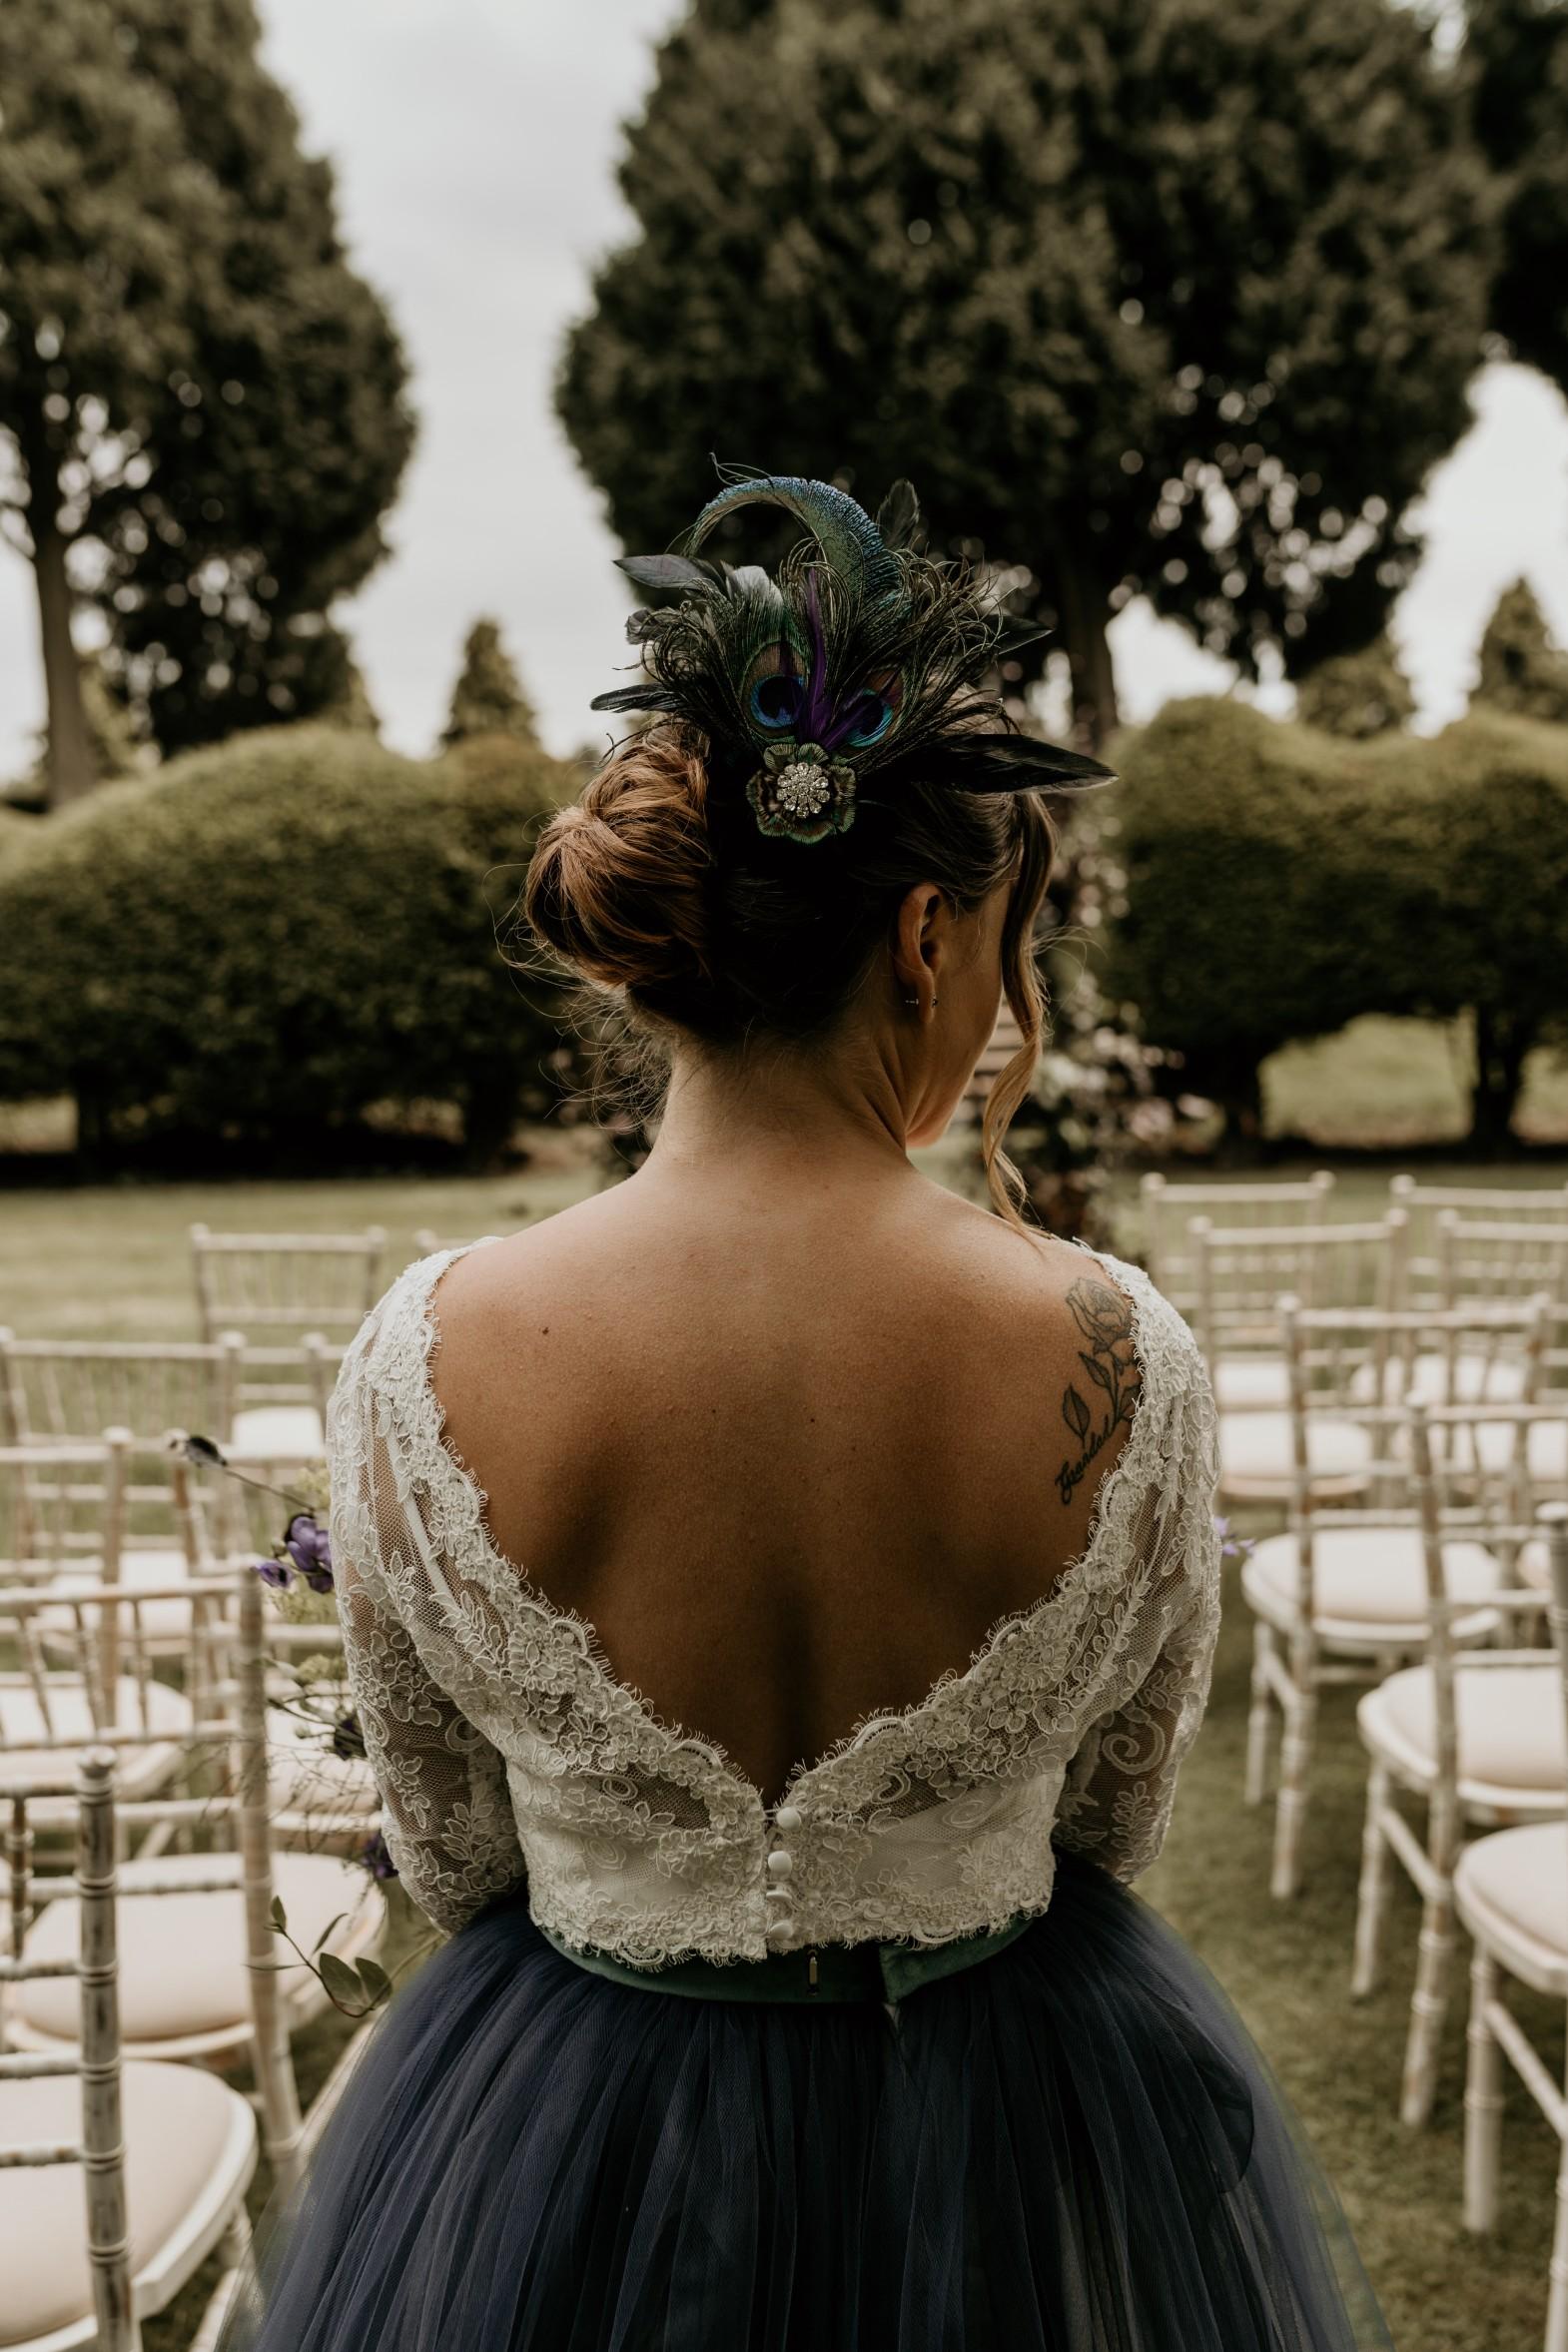 unique wedding headdress - peacock wedding headdress - peacock bridal headpiece